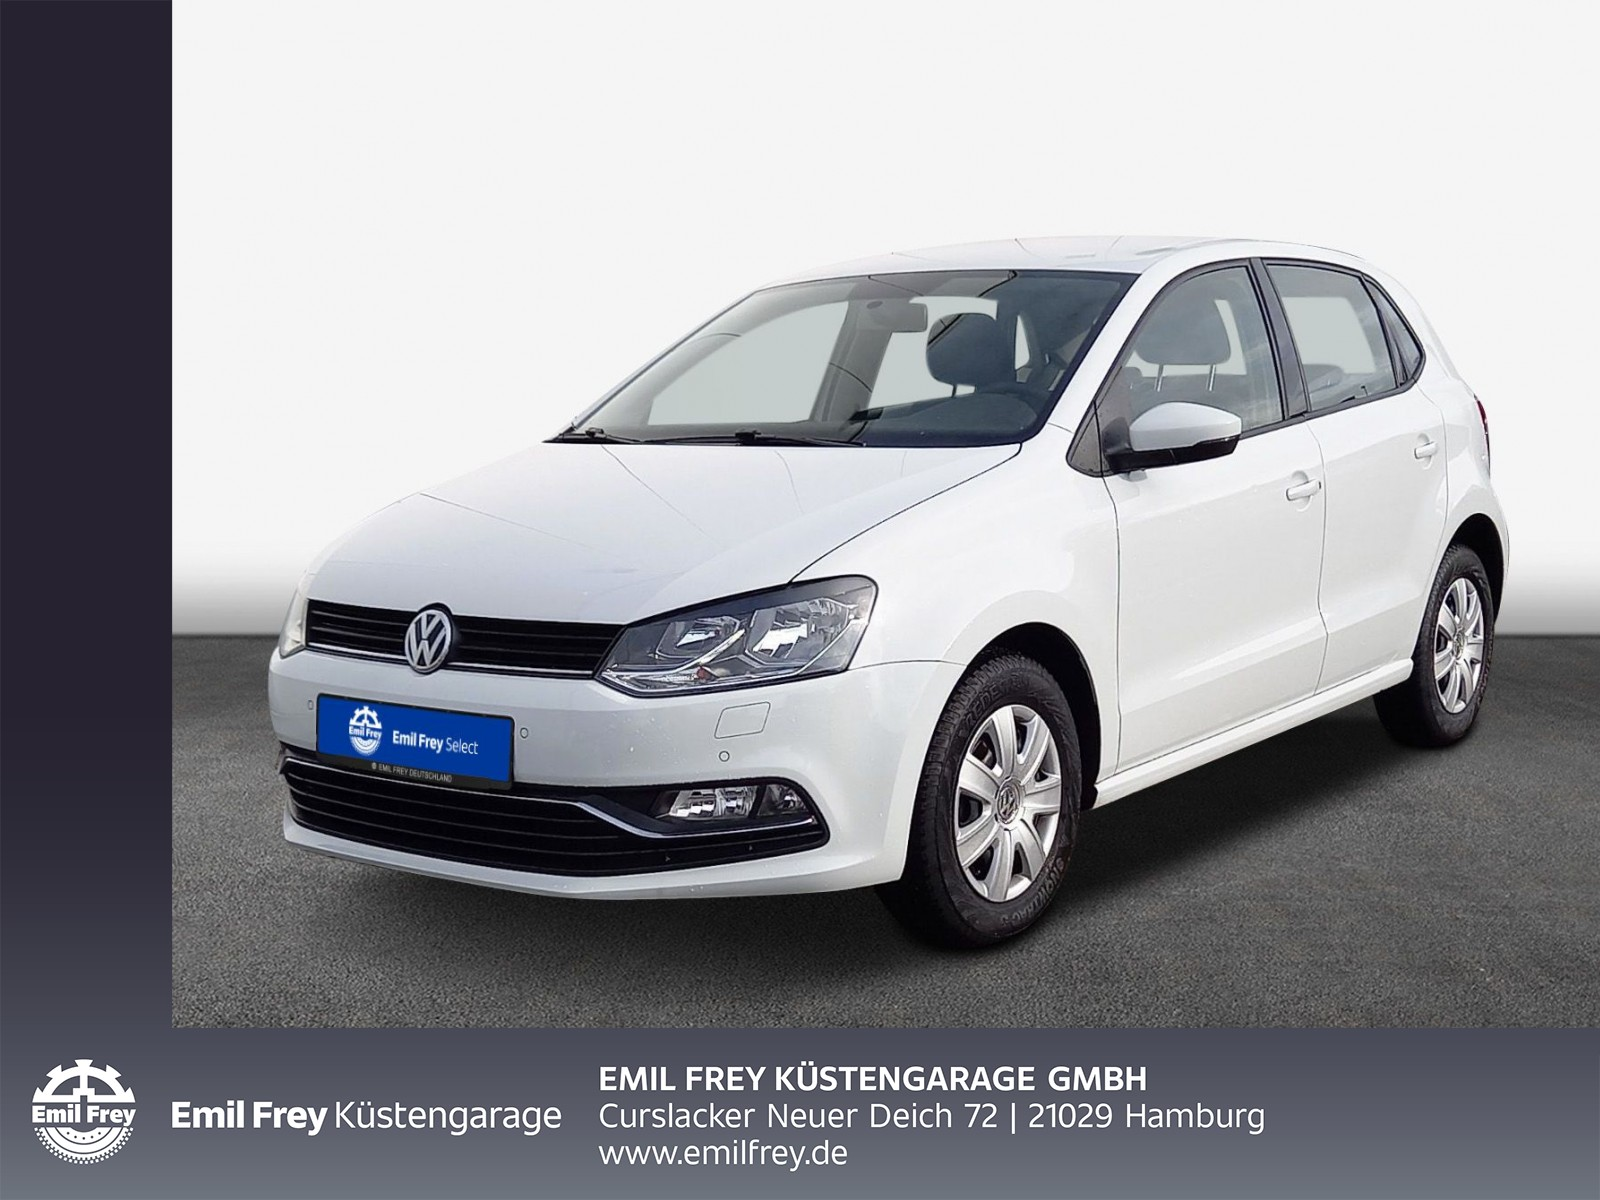 Volkswagen Polo 1.2 Comfortline MAL, PDC, KLIMA, Jahr 2014, Benzin